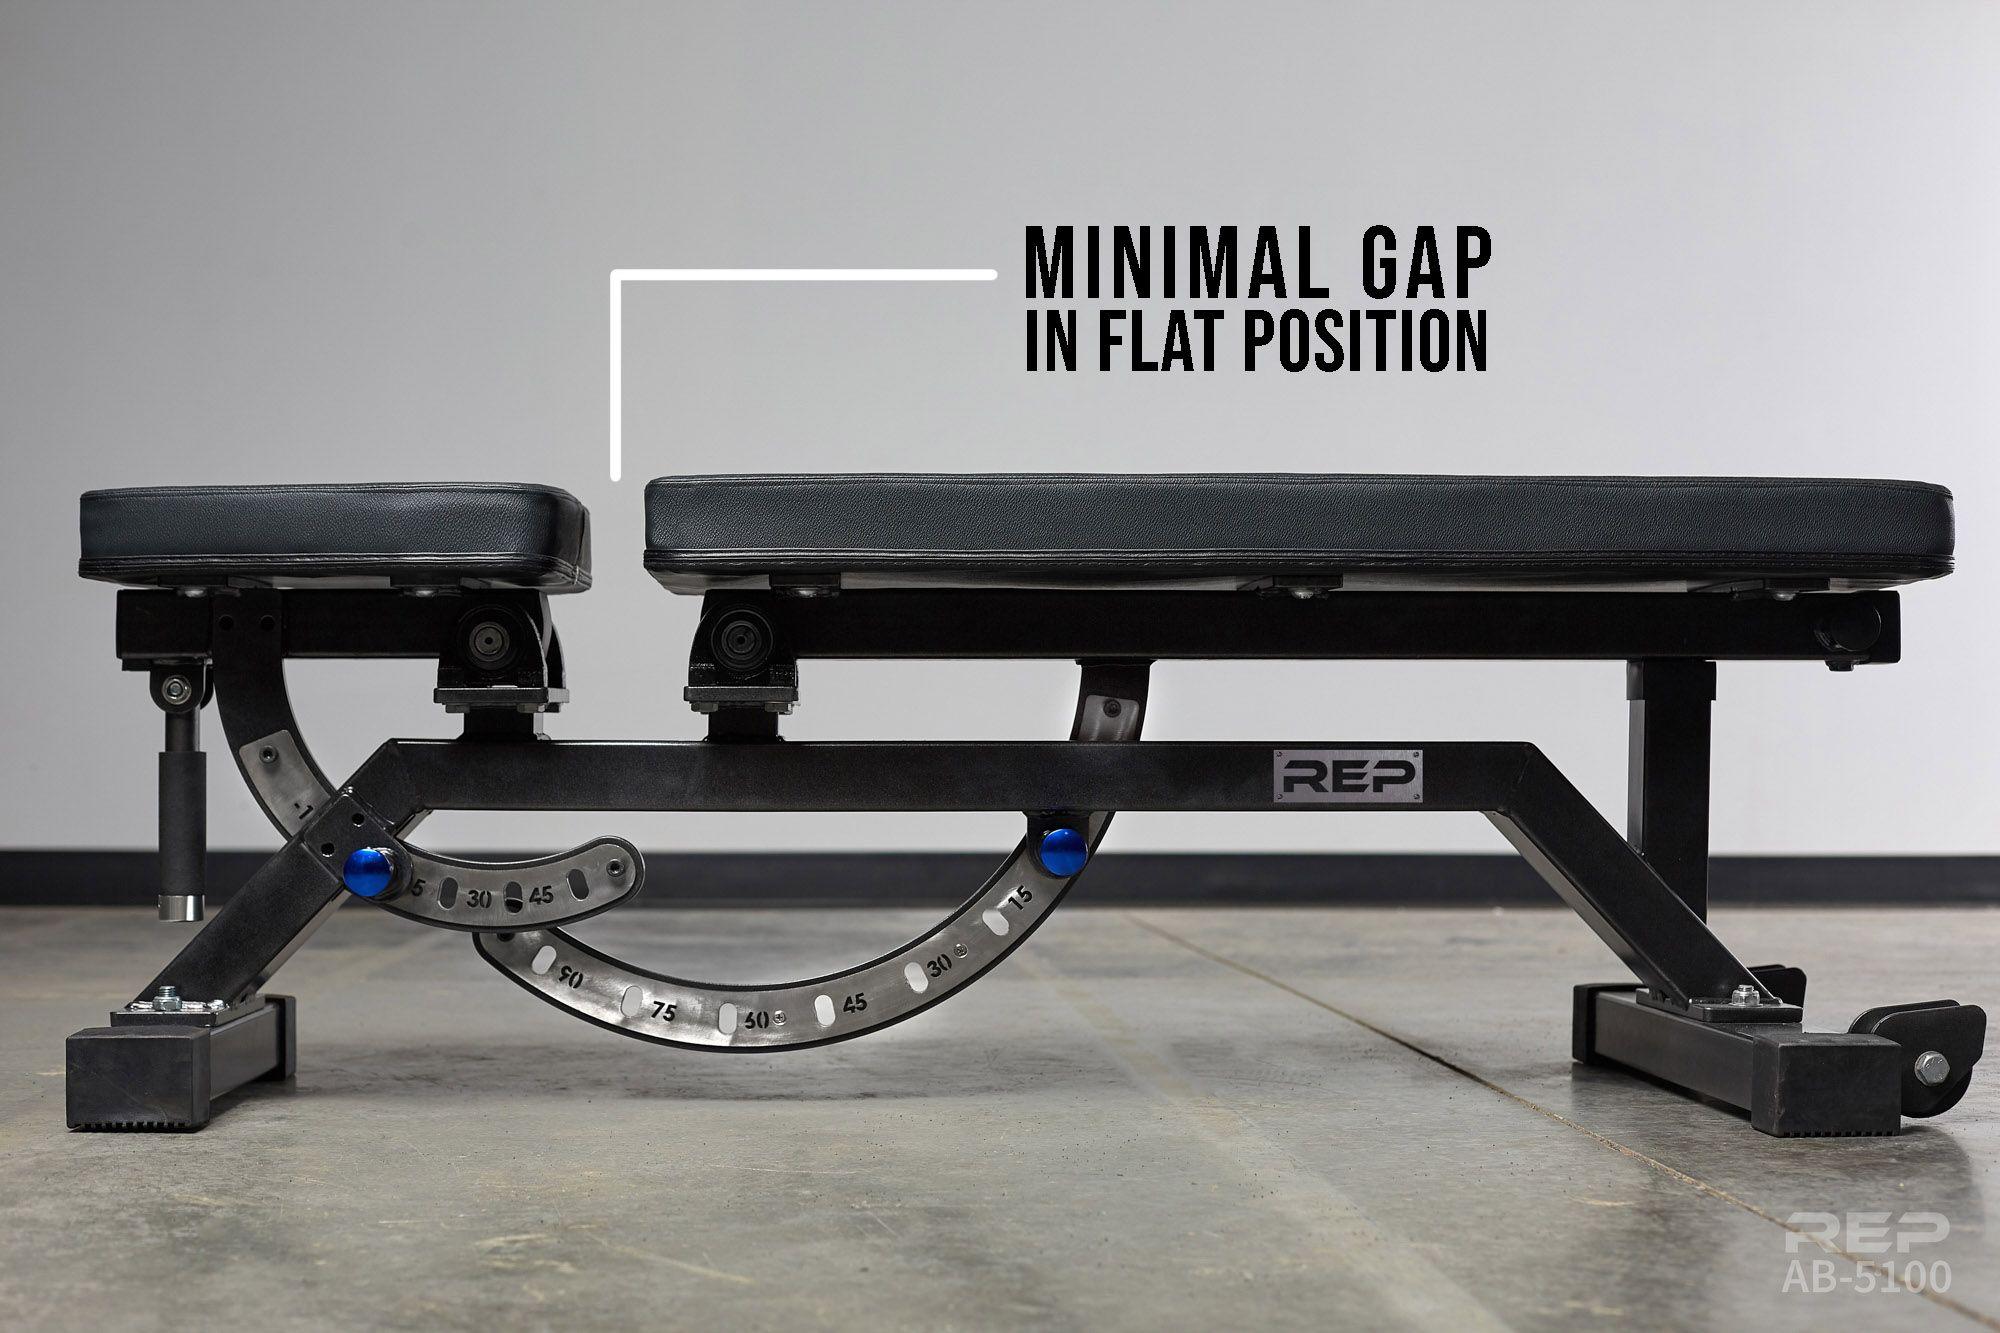 Rep Ab 5100 Adjustable Bench Garage Gym Bench Workout Home Gym Bench